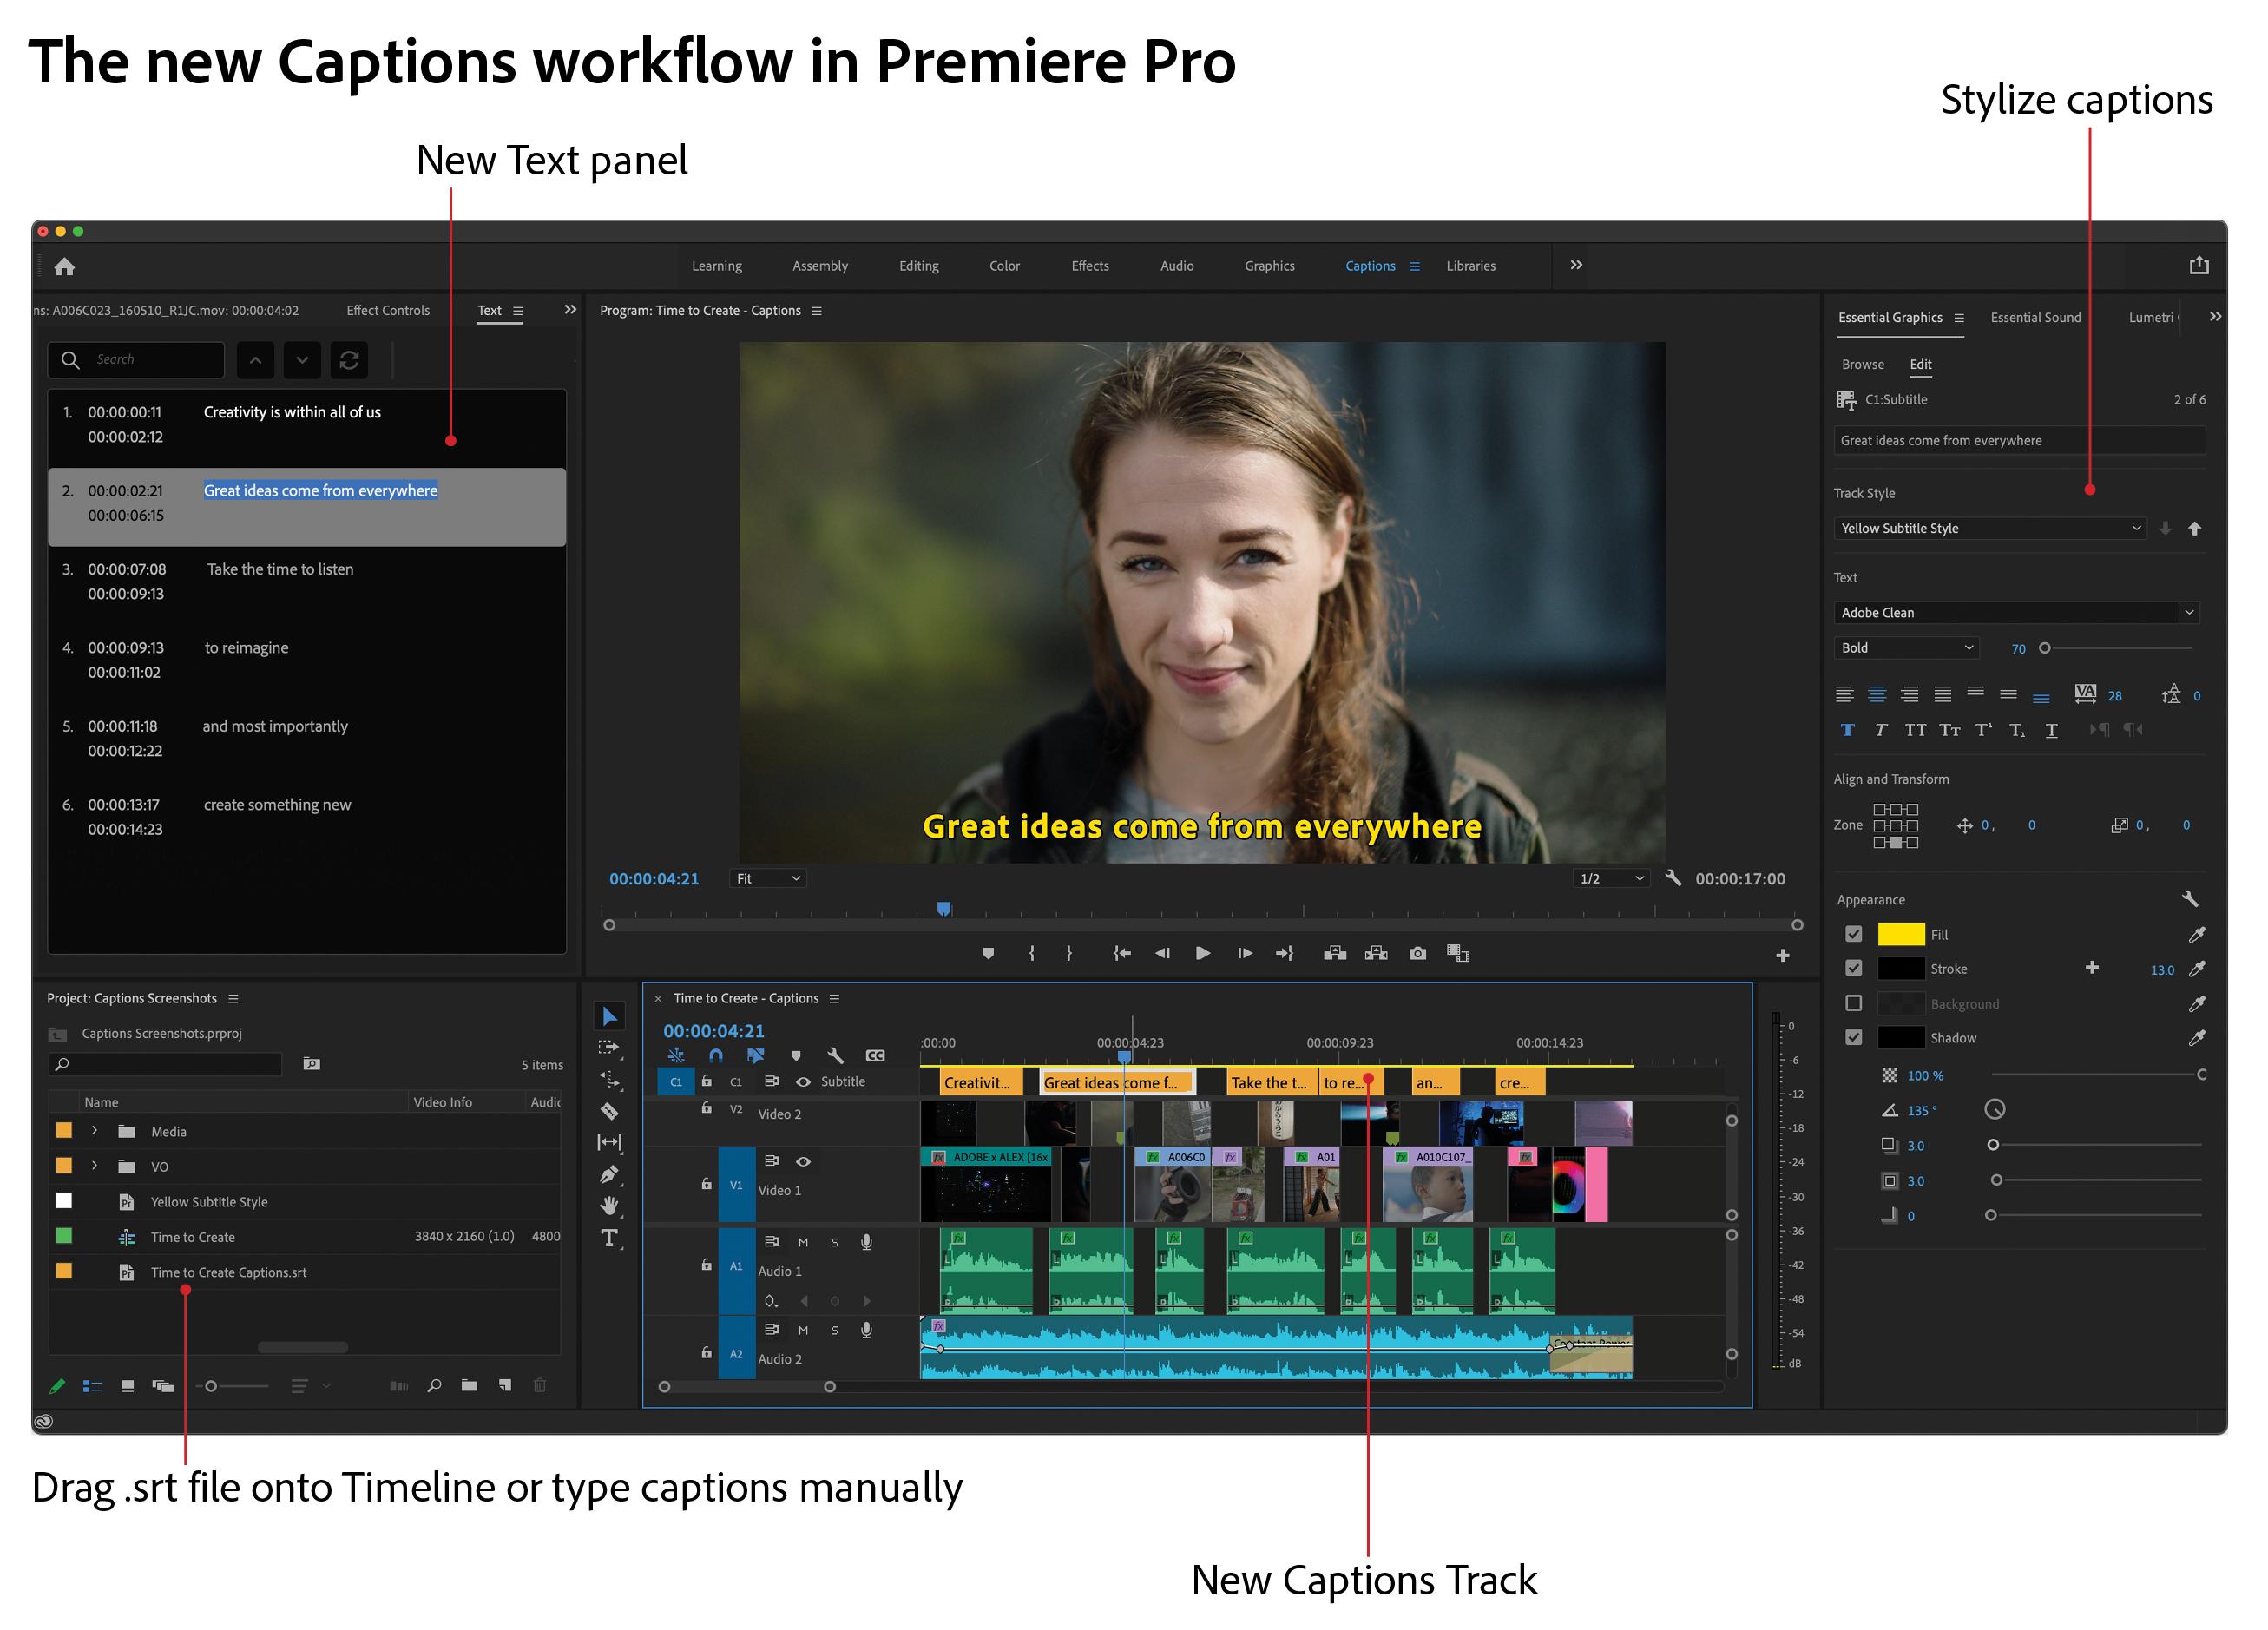 Pr__New-Captions-Workflow